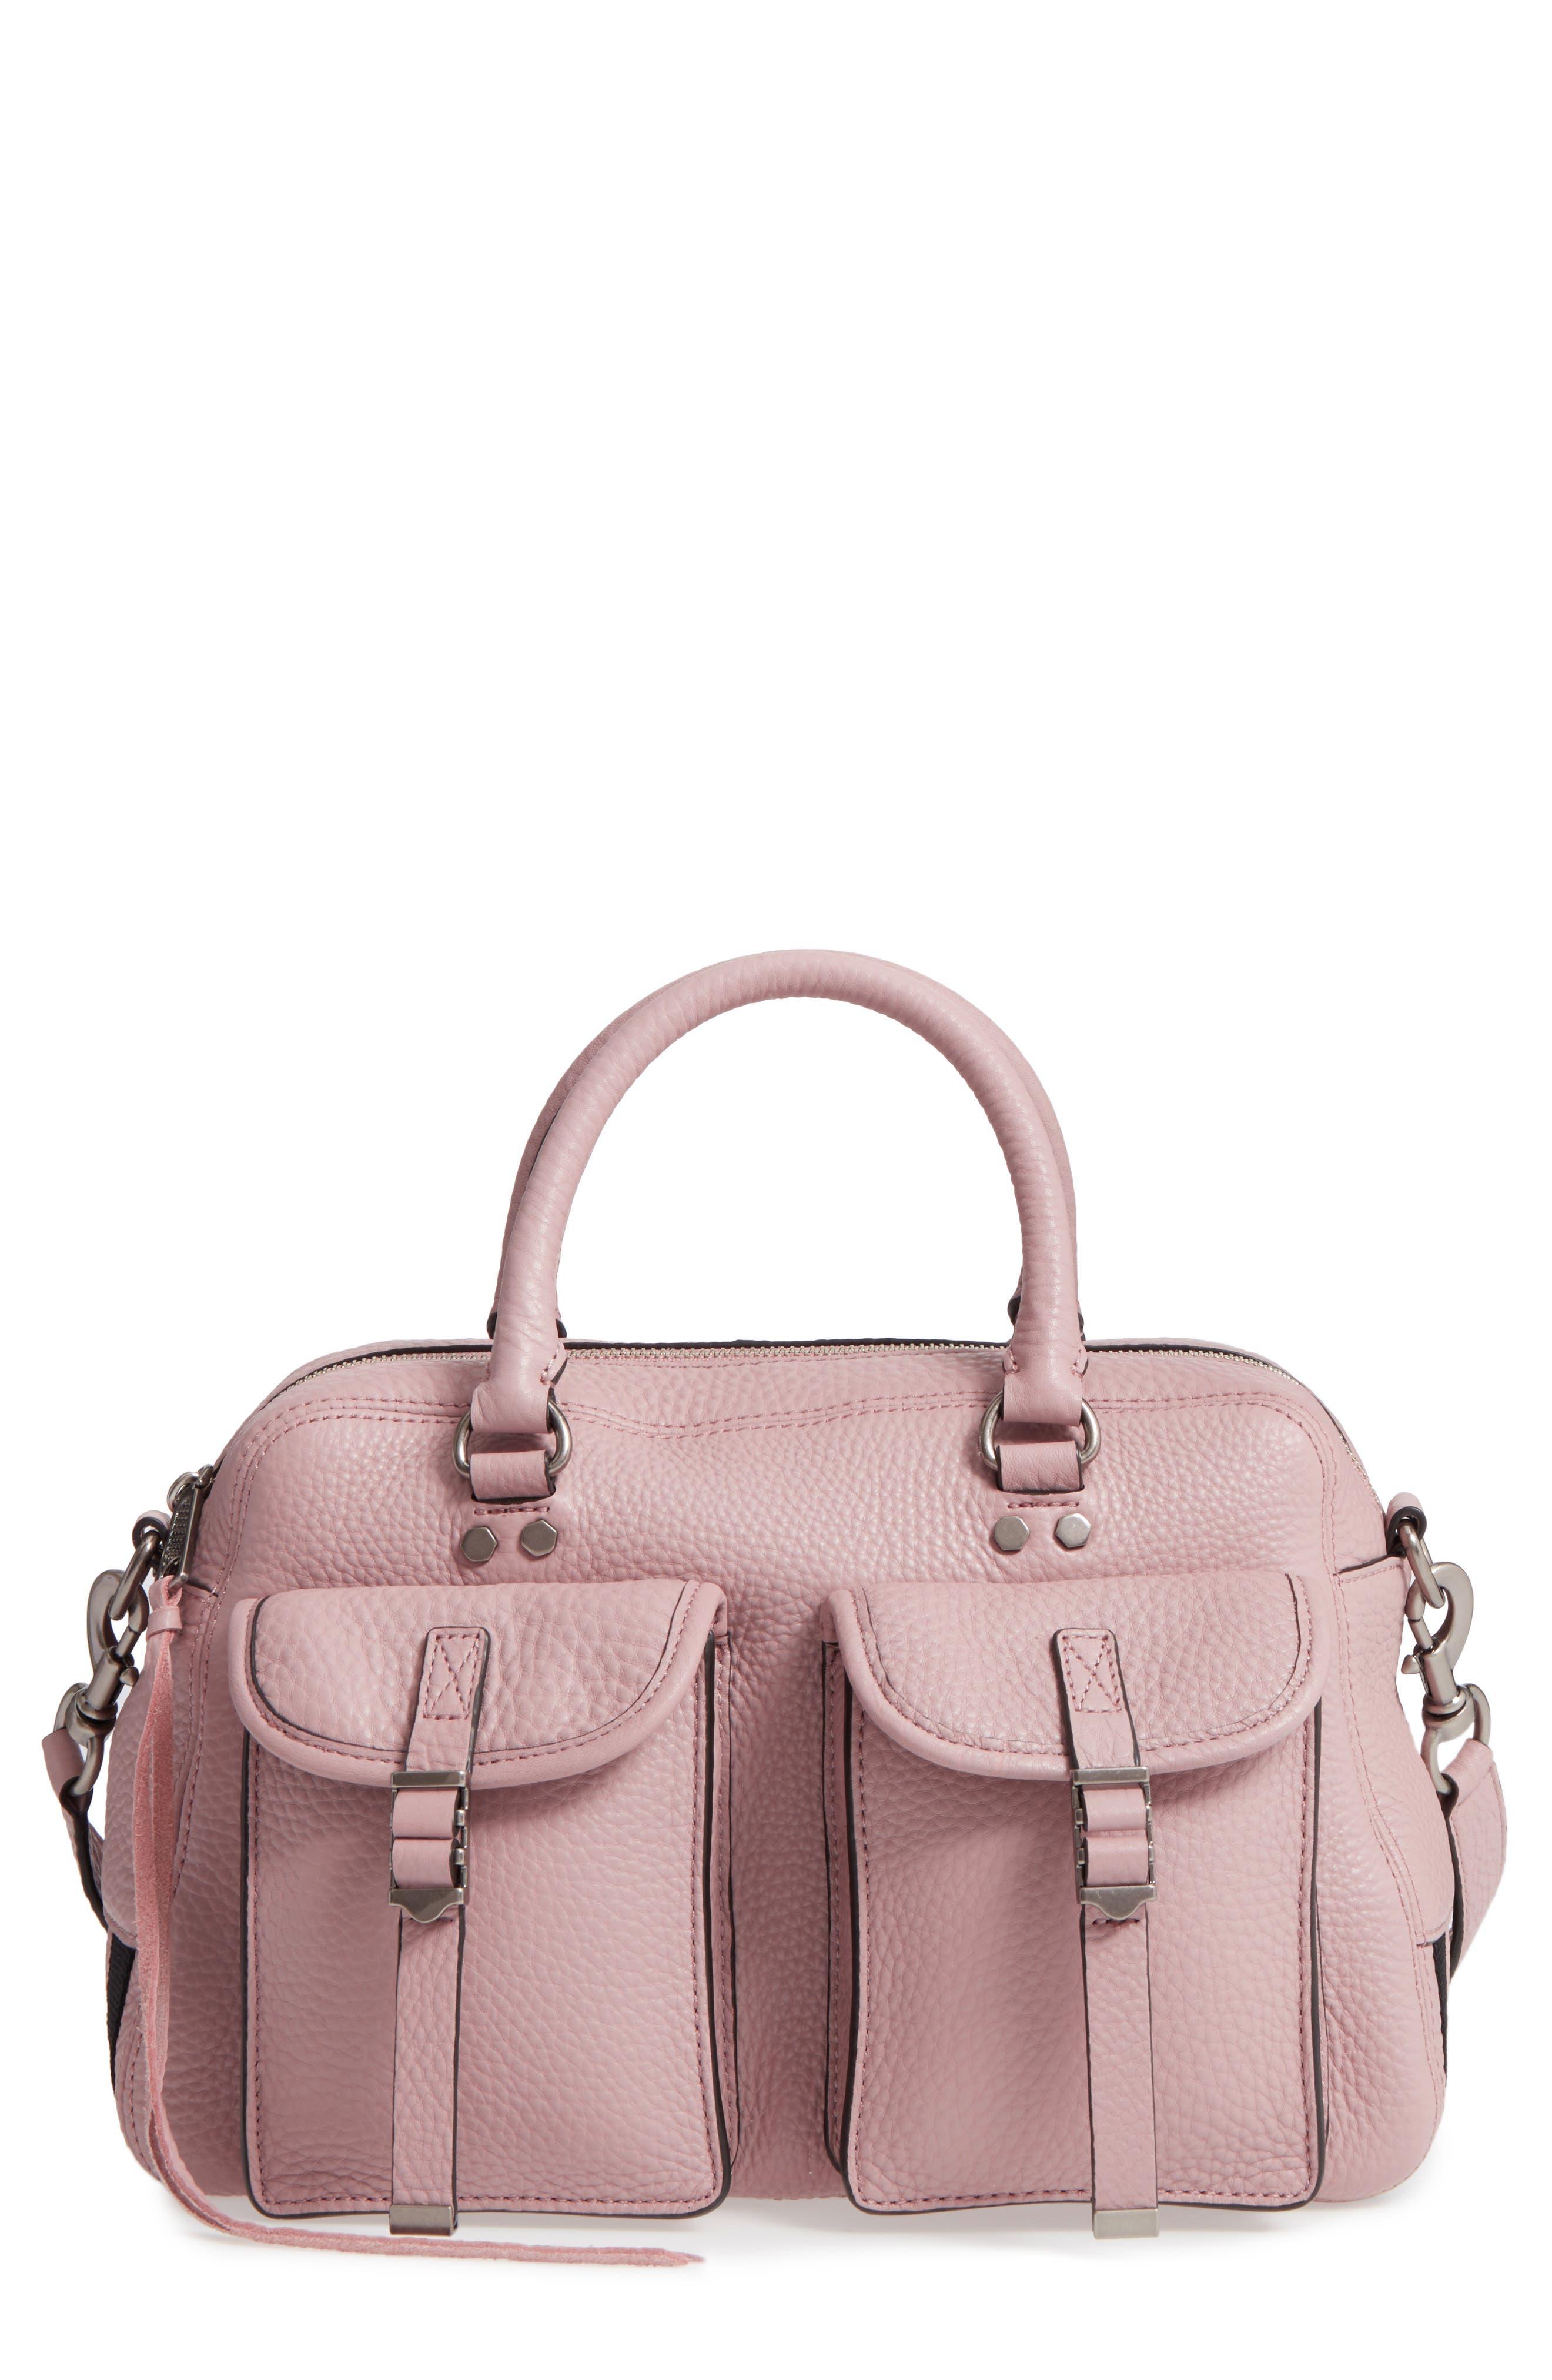 Military Pocket Leather Satchel,                             Main thumbnail 1, color,                             Vintage Pink